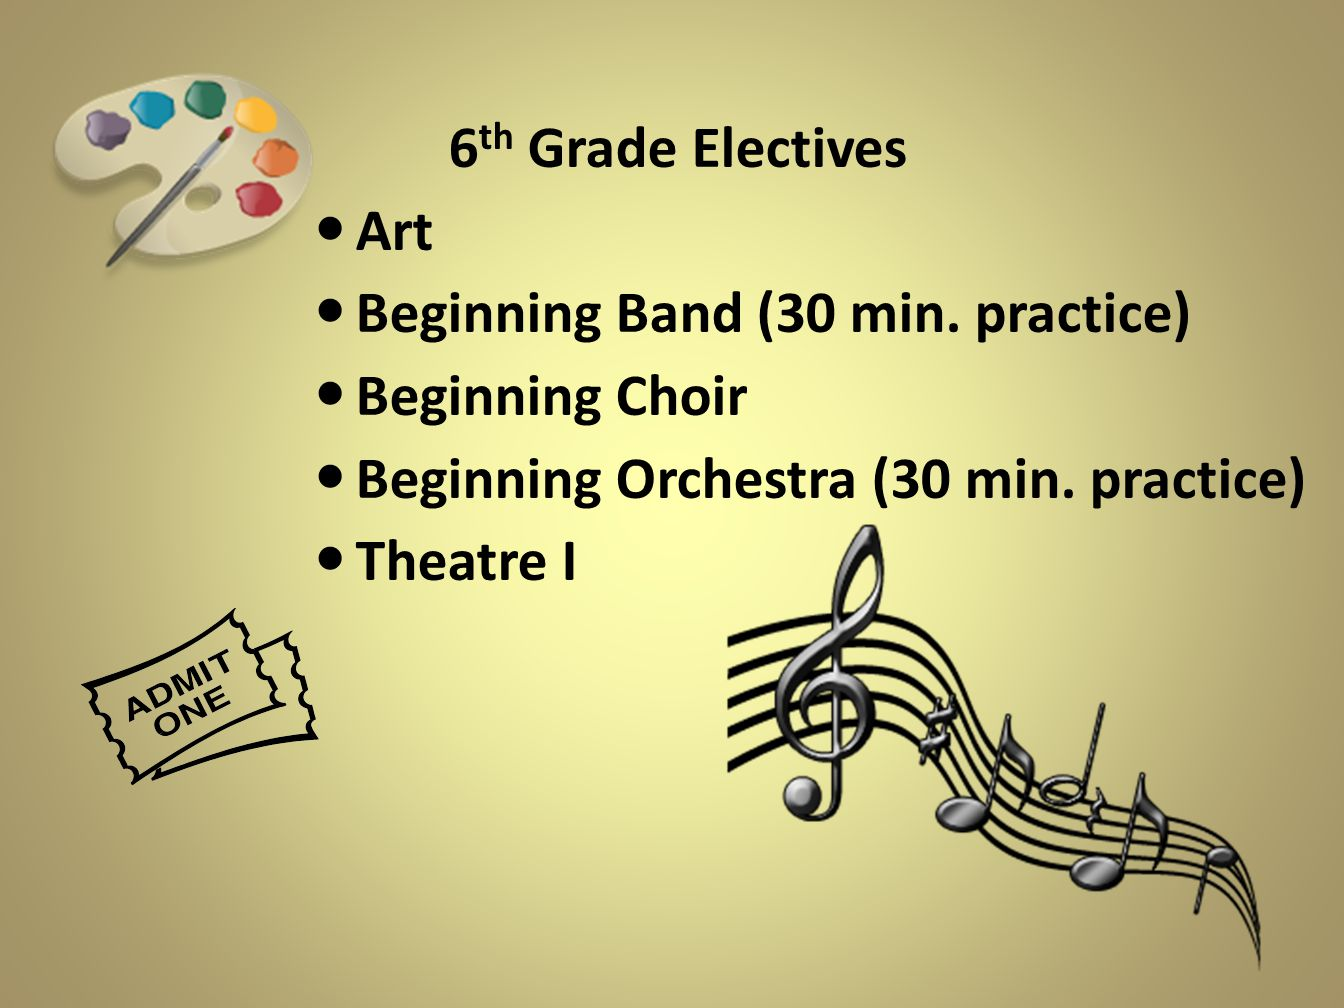 6th Grade Electives Art. Beginning Band (30 min. practice) Beginning Choir. Beginning Orchestra (30 min. practice)